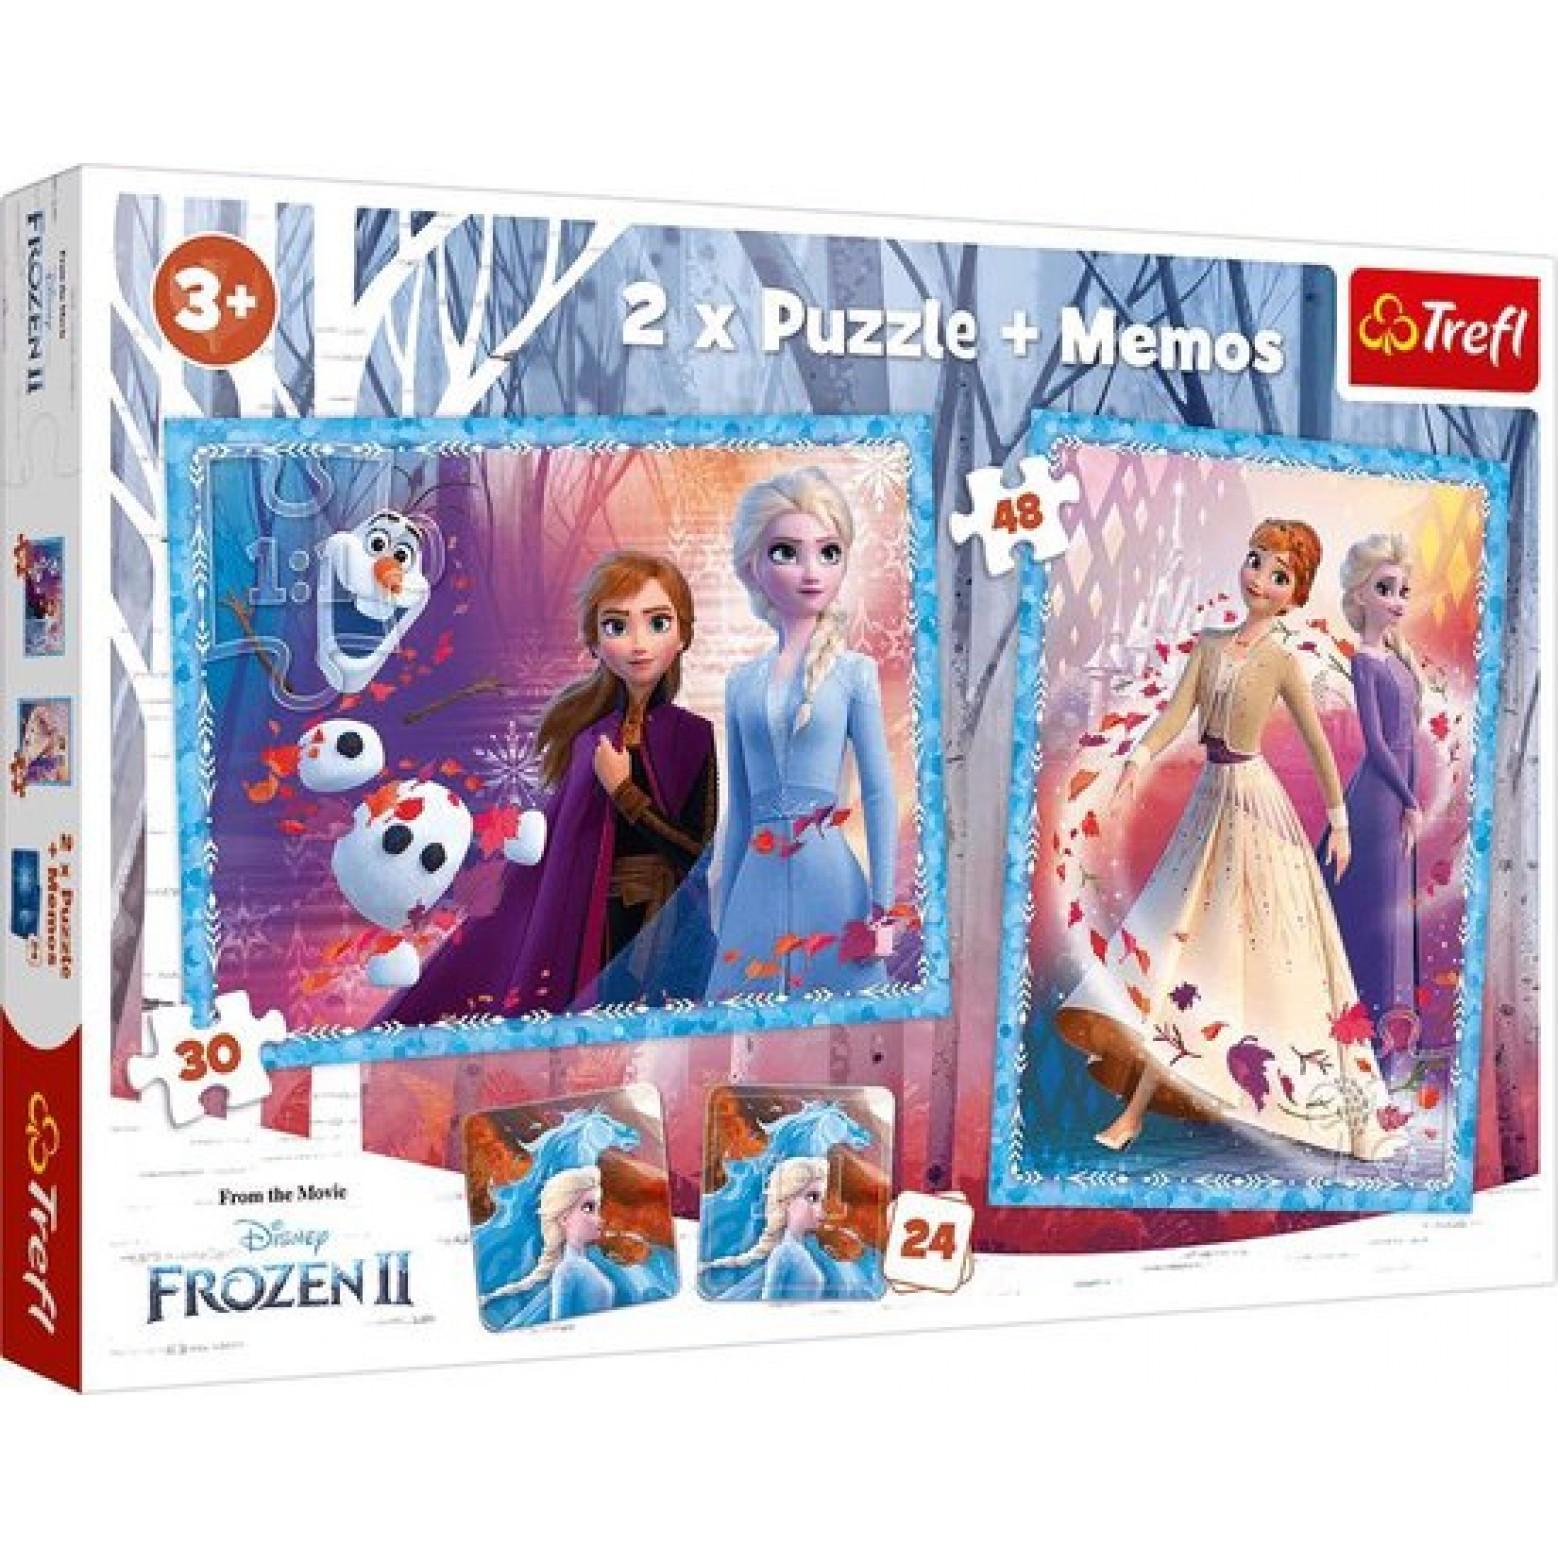 Disney Frozen 2 puzzel 2 in 1 + Memory